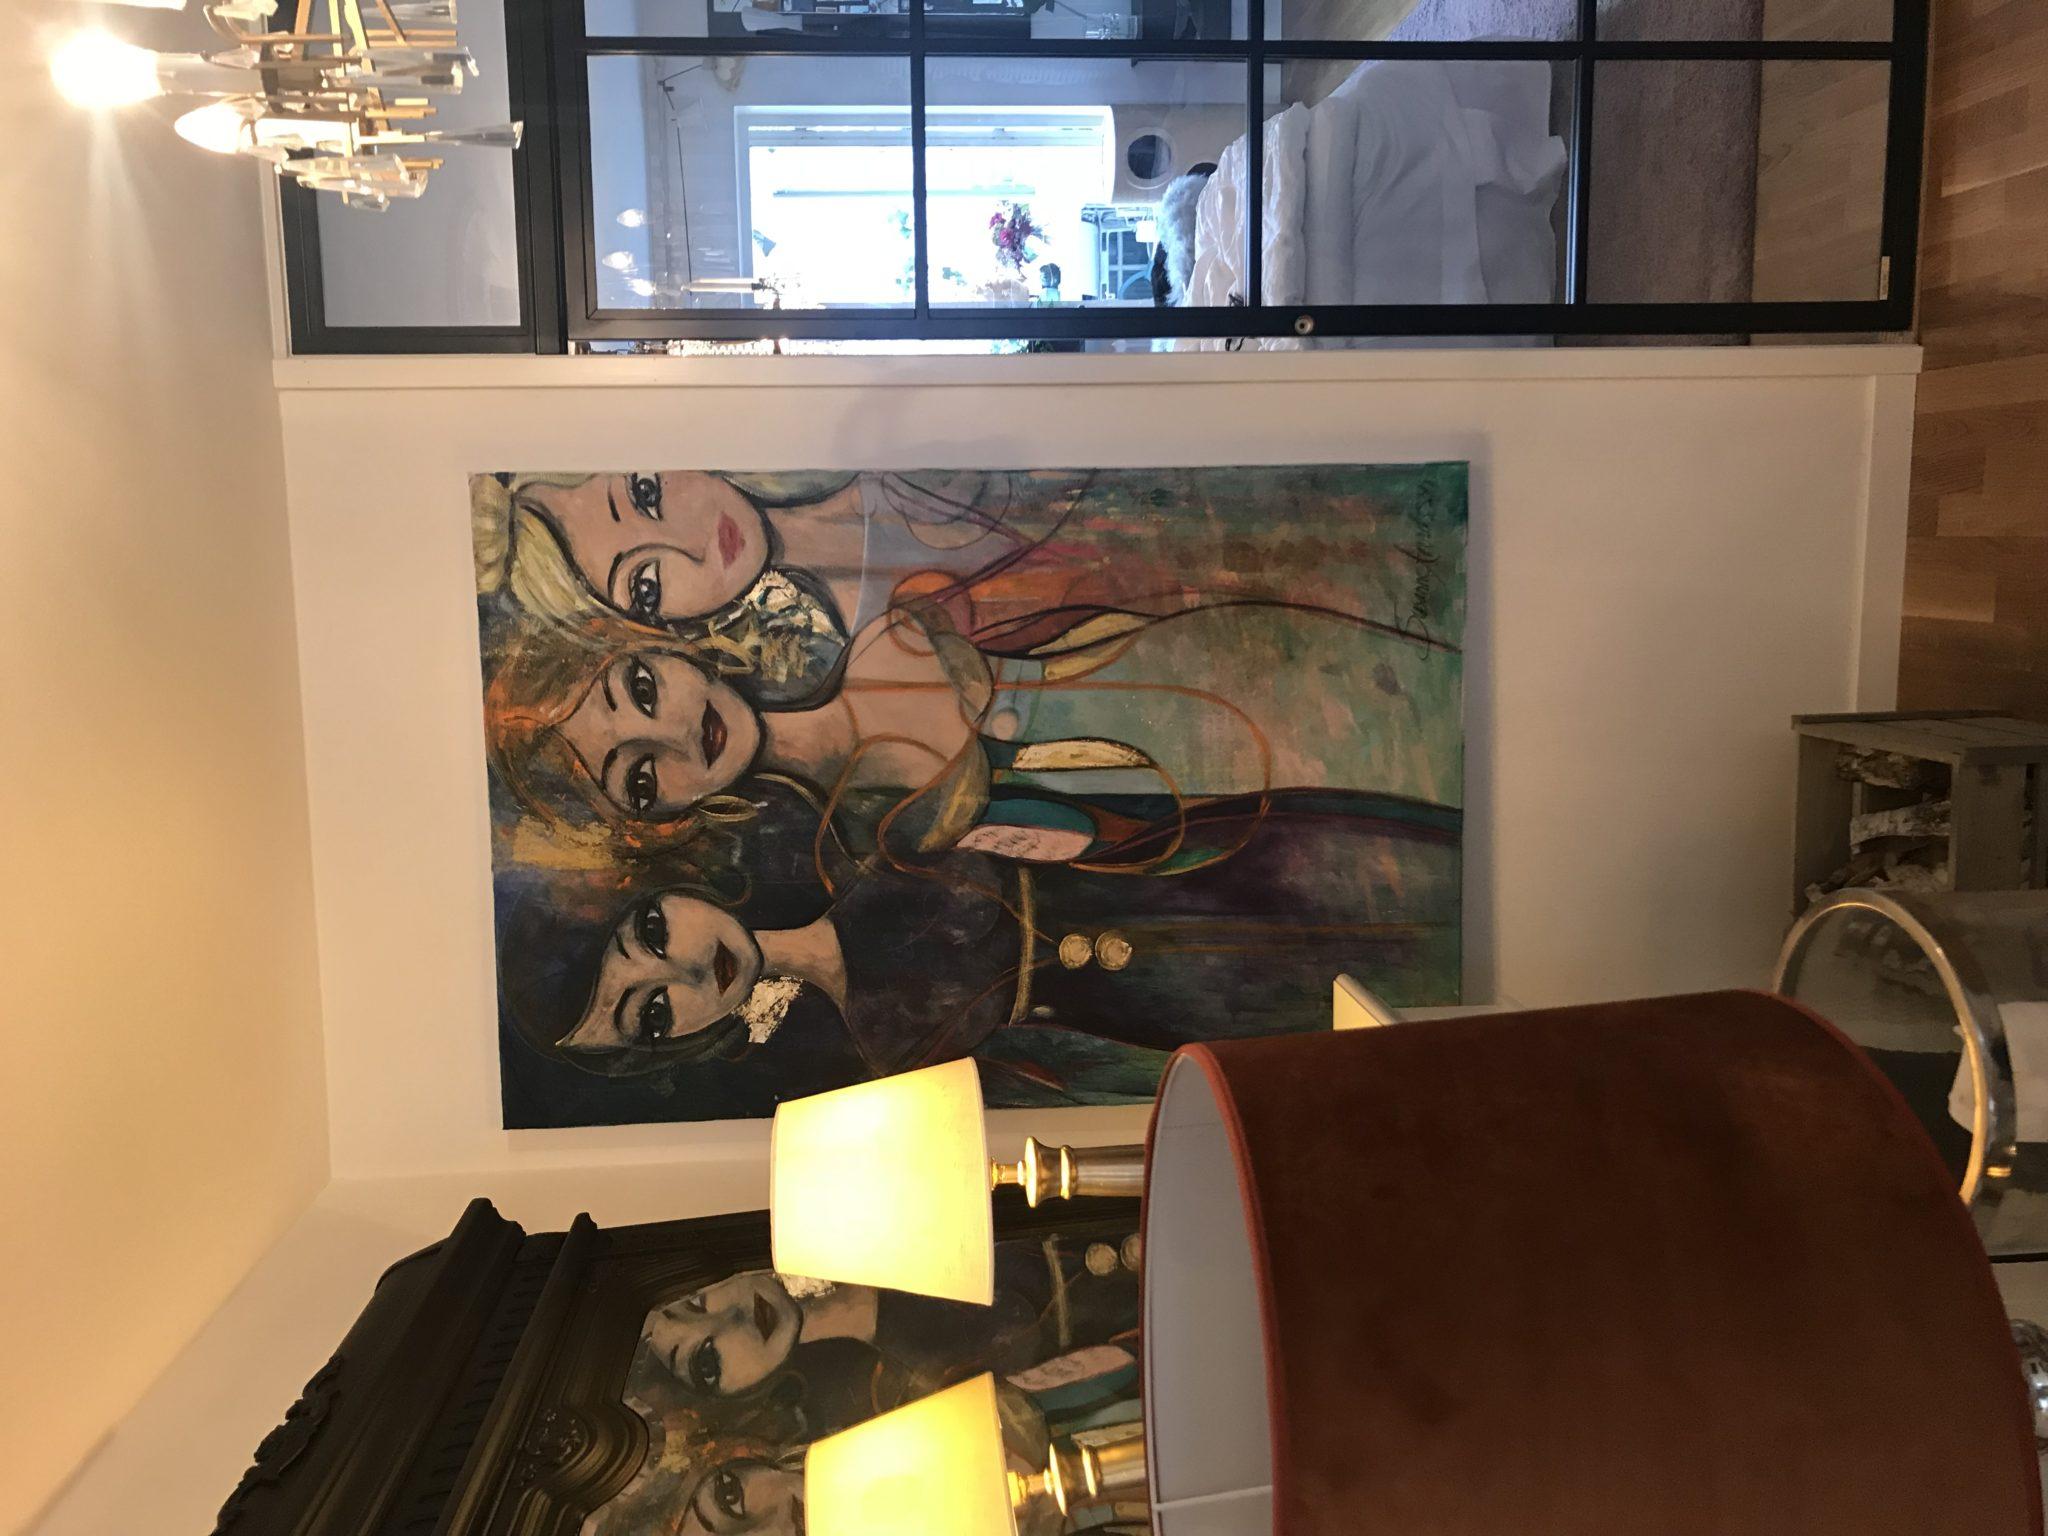 Konst till salu - Fredag- min dag i ateljén